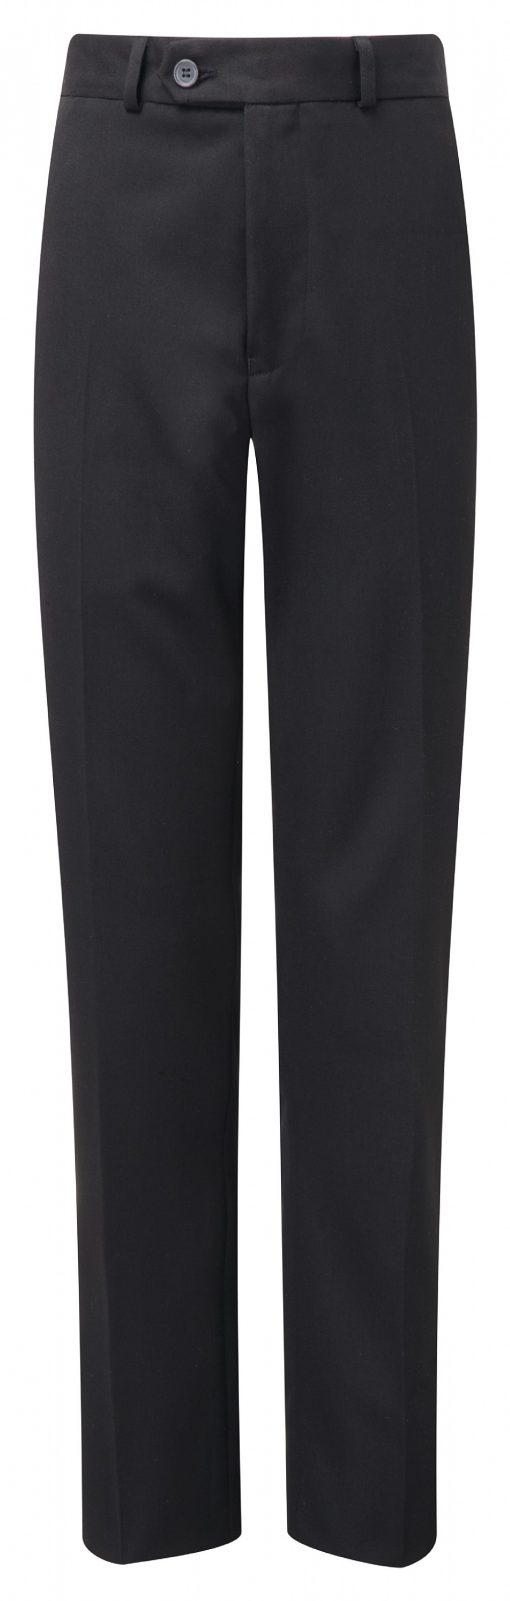 Boys Navy Slim Bridge trouser